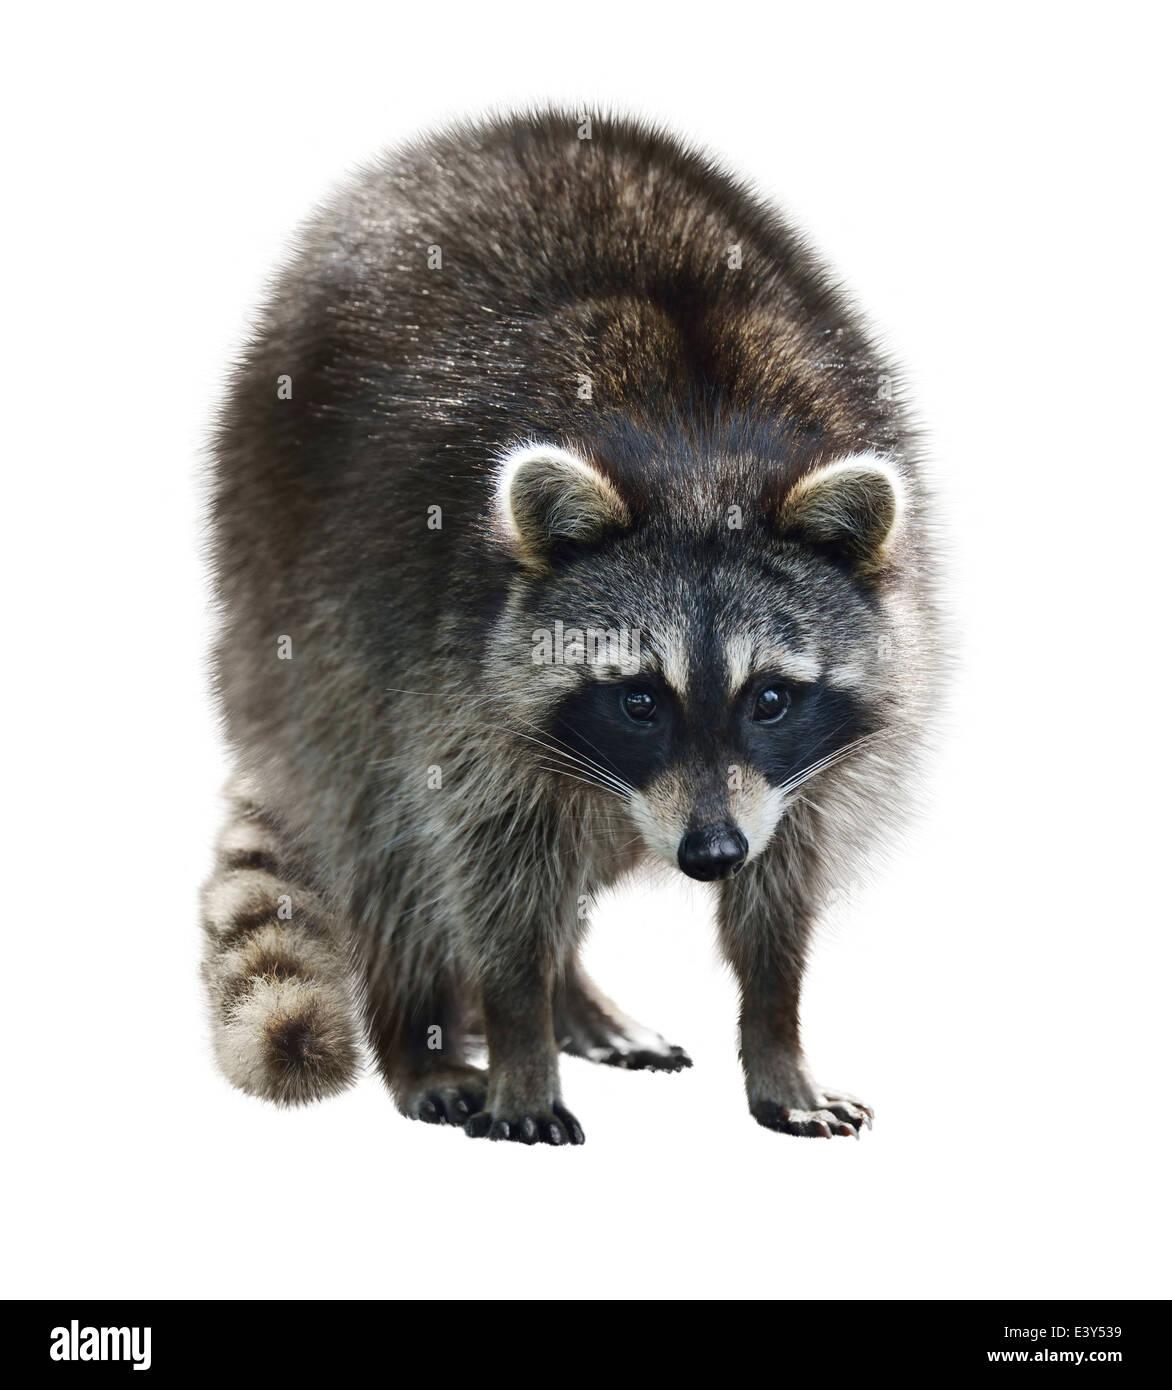 Giovani Raccoon isolati su sfondo bianco Immagini Stock